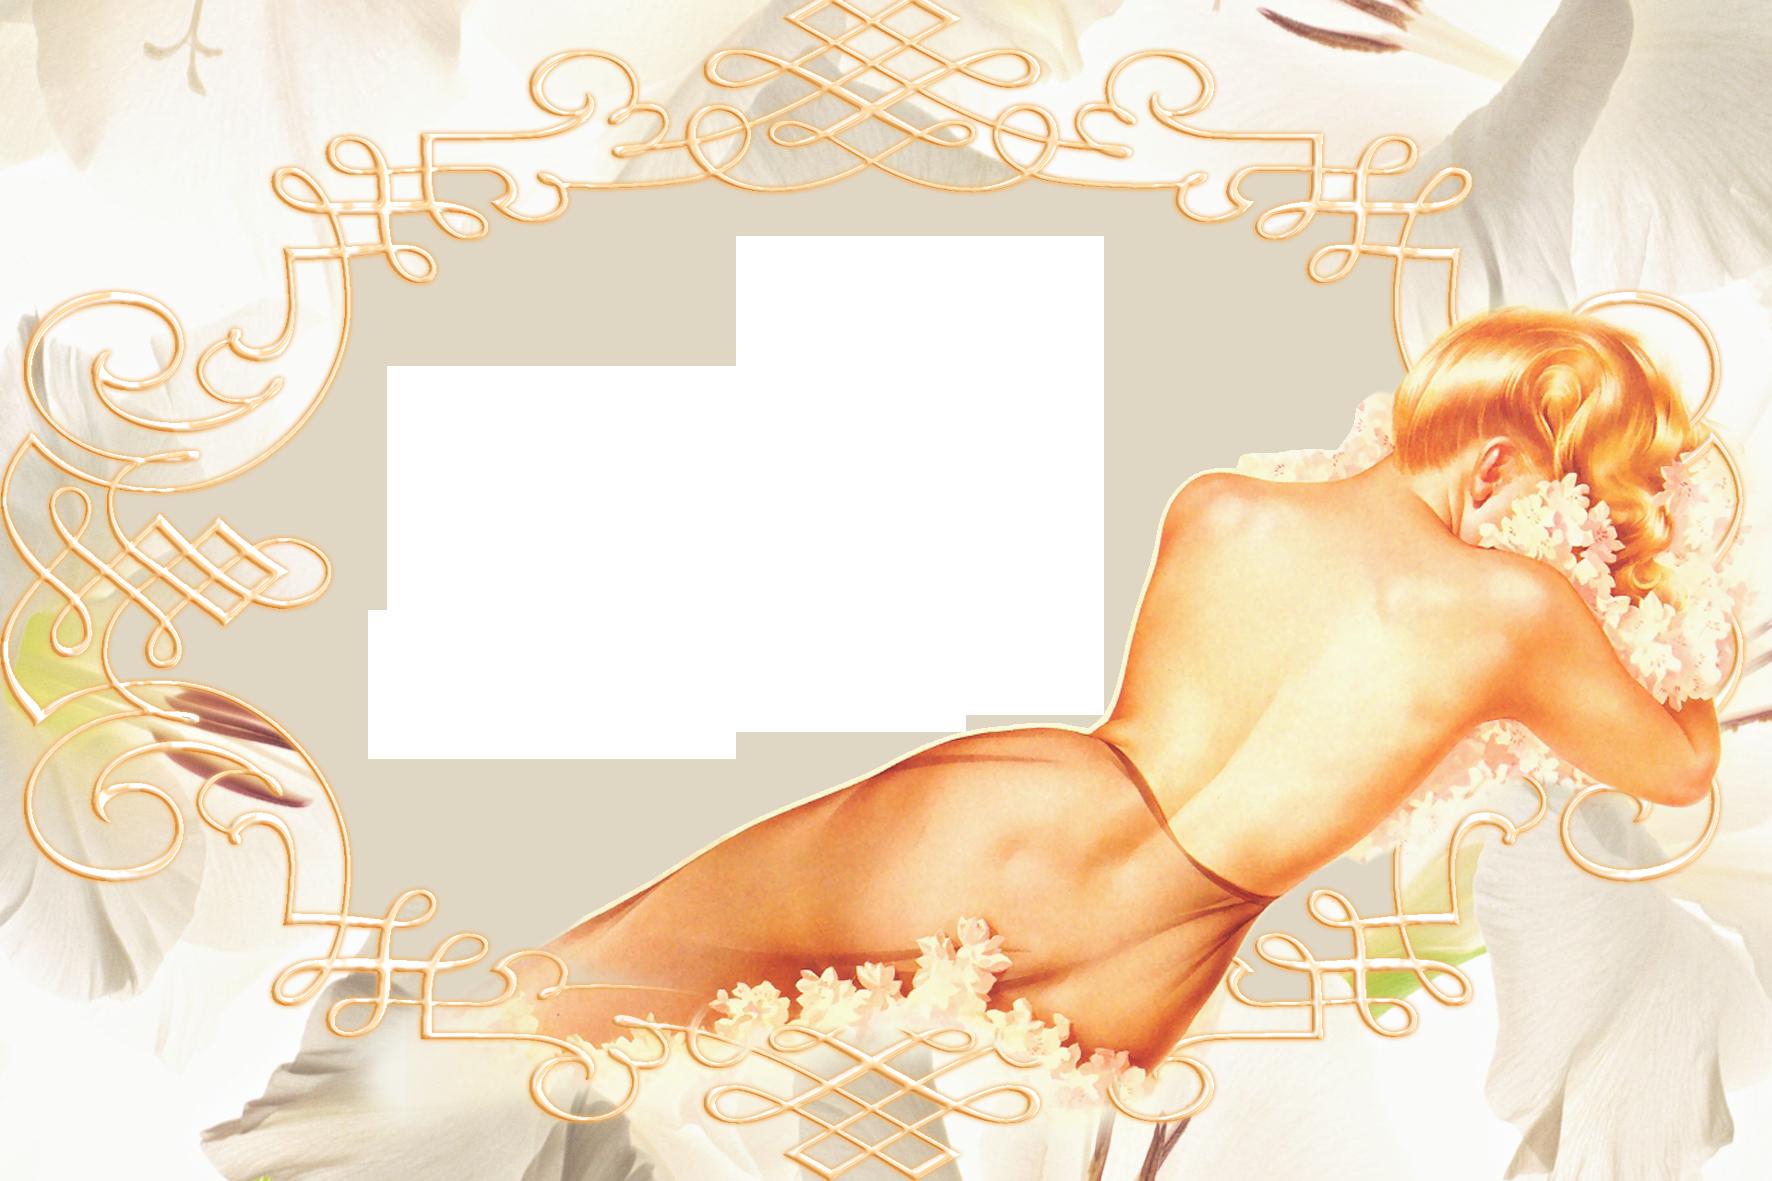 порно онлайн фоторамки